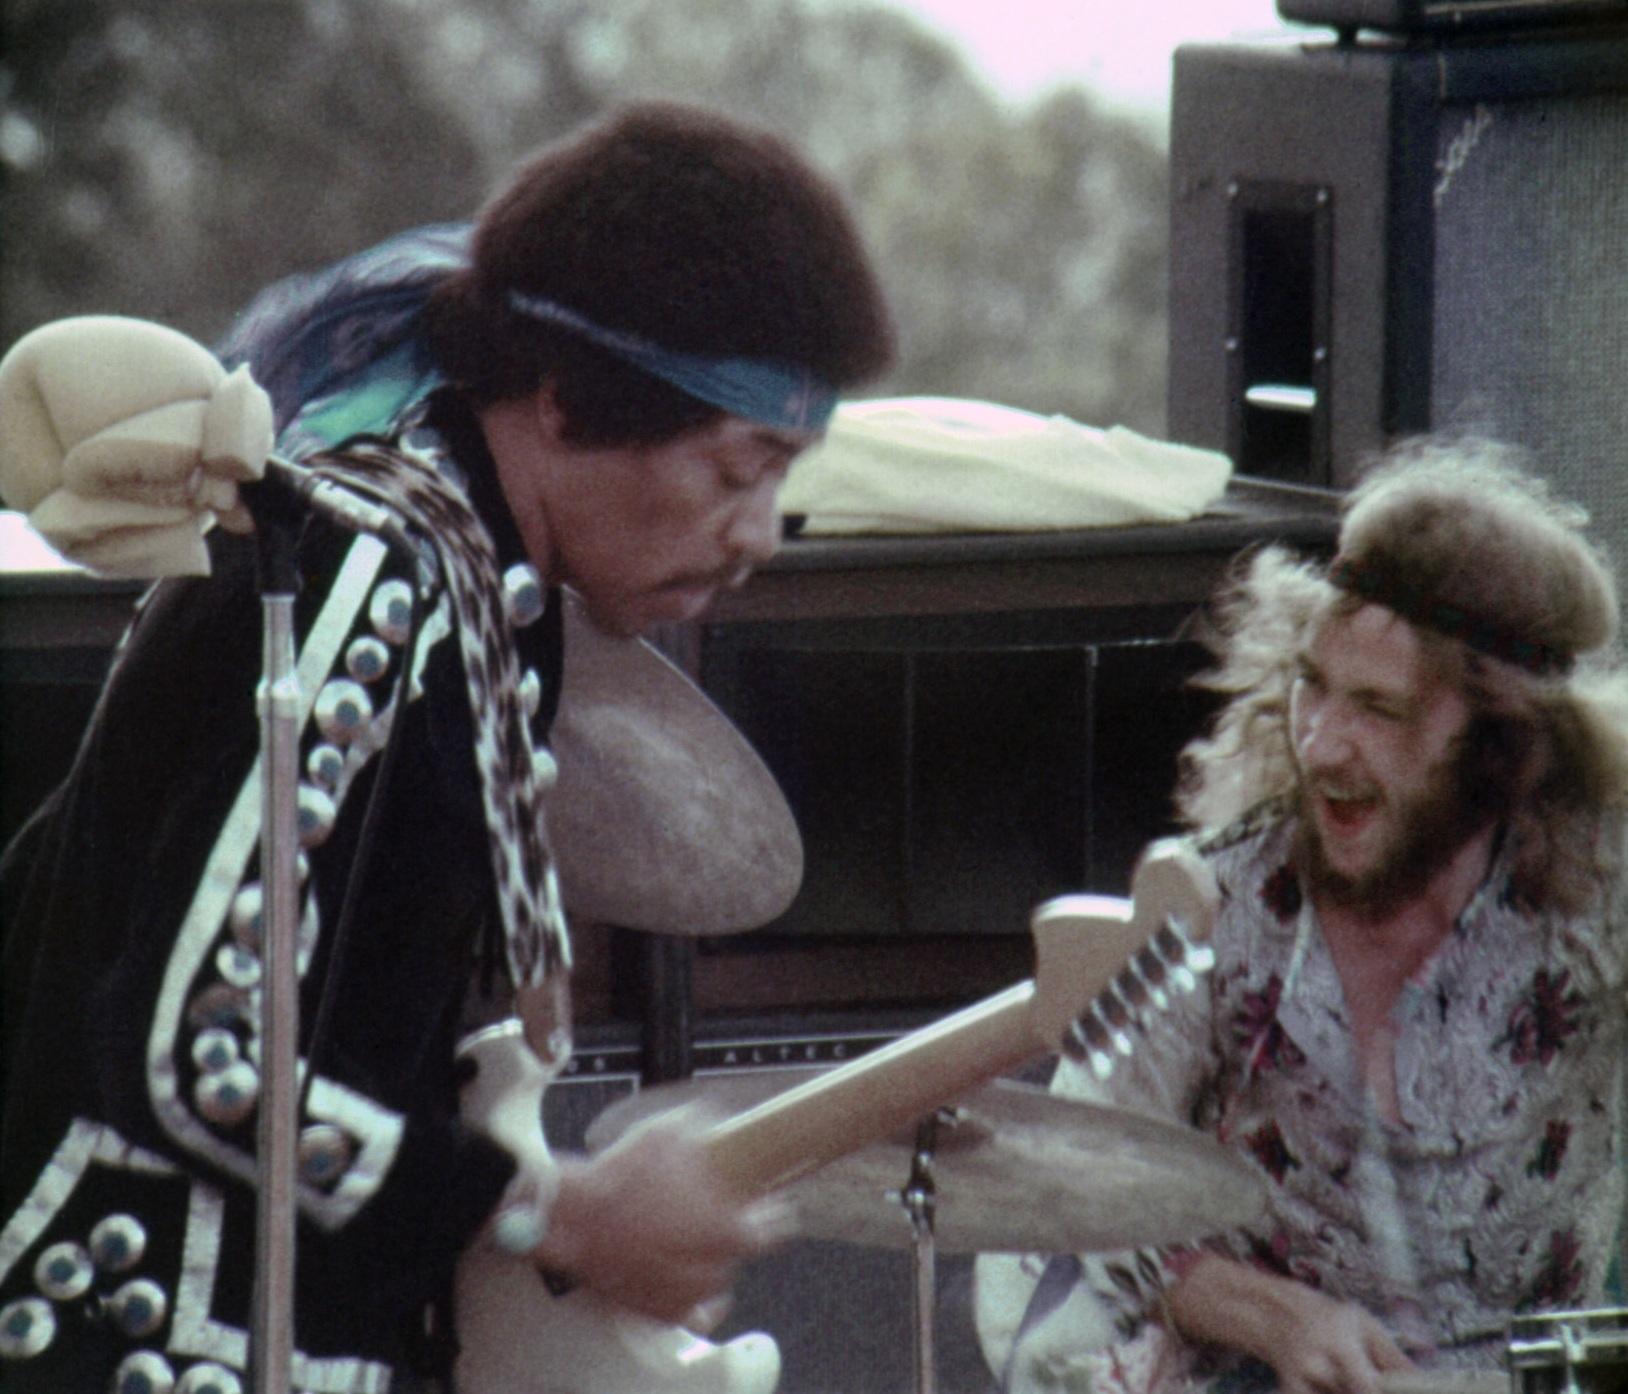 Maui (Haleakala Crater) : 30 juillet 1970 [Second concert] 40ac8a1624548c6100c83f6977b3195a